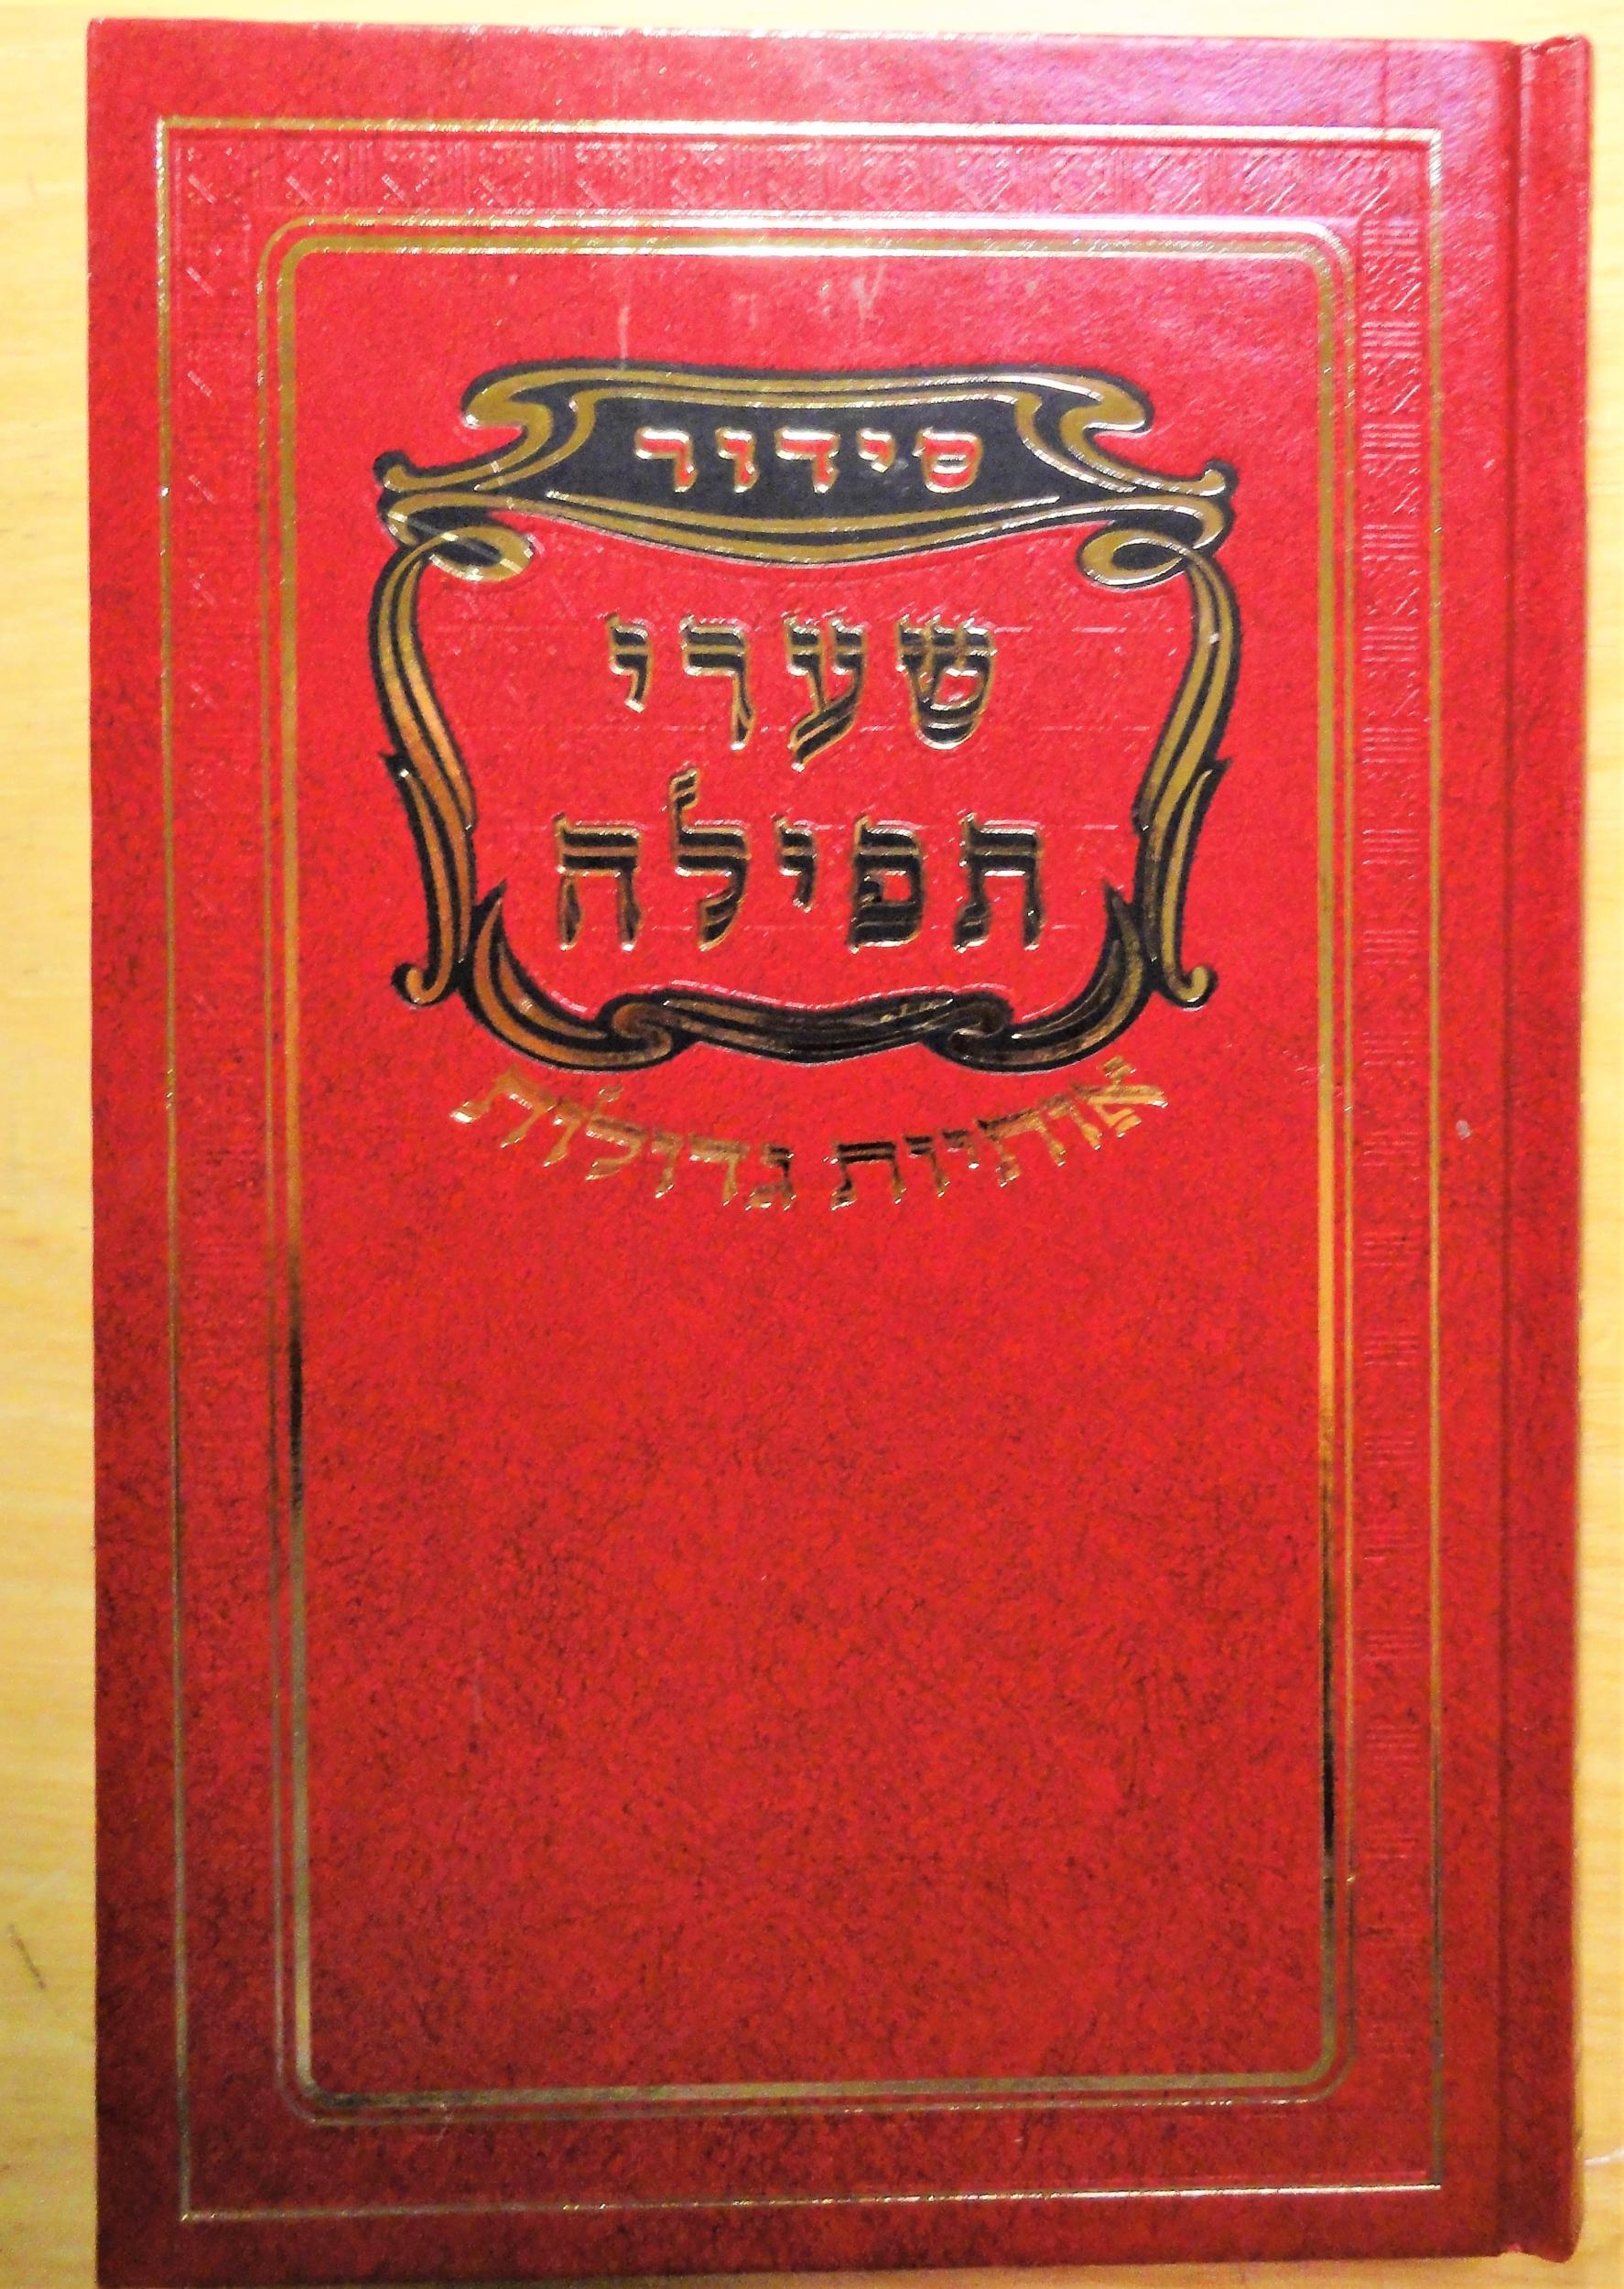 Sidour Chaaré tefilah (gros lettres)